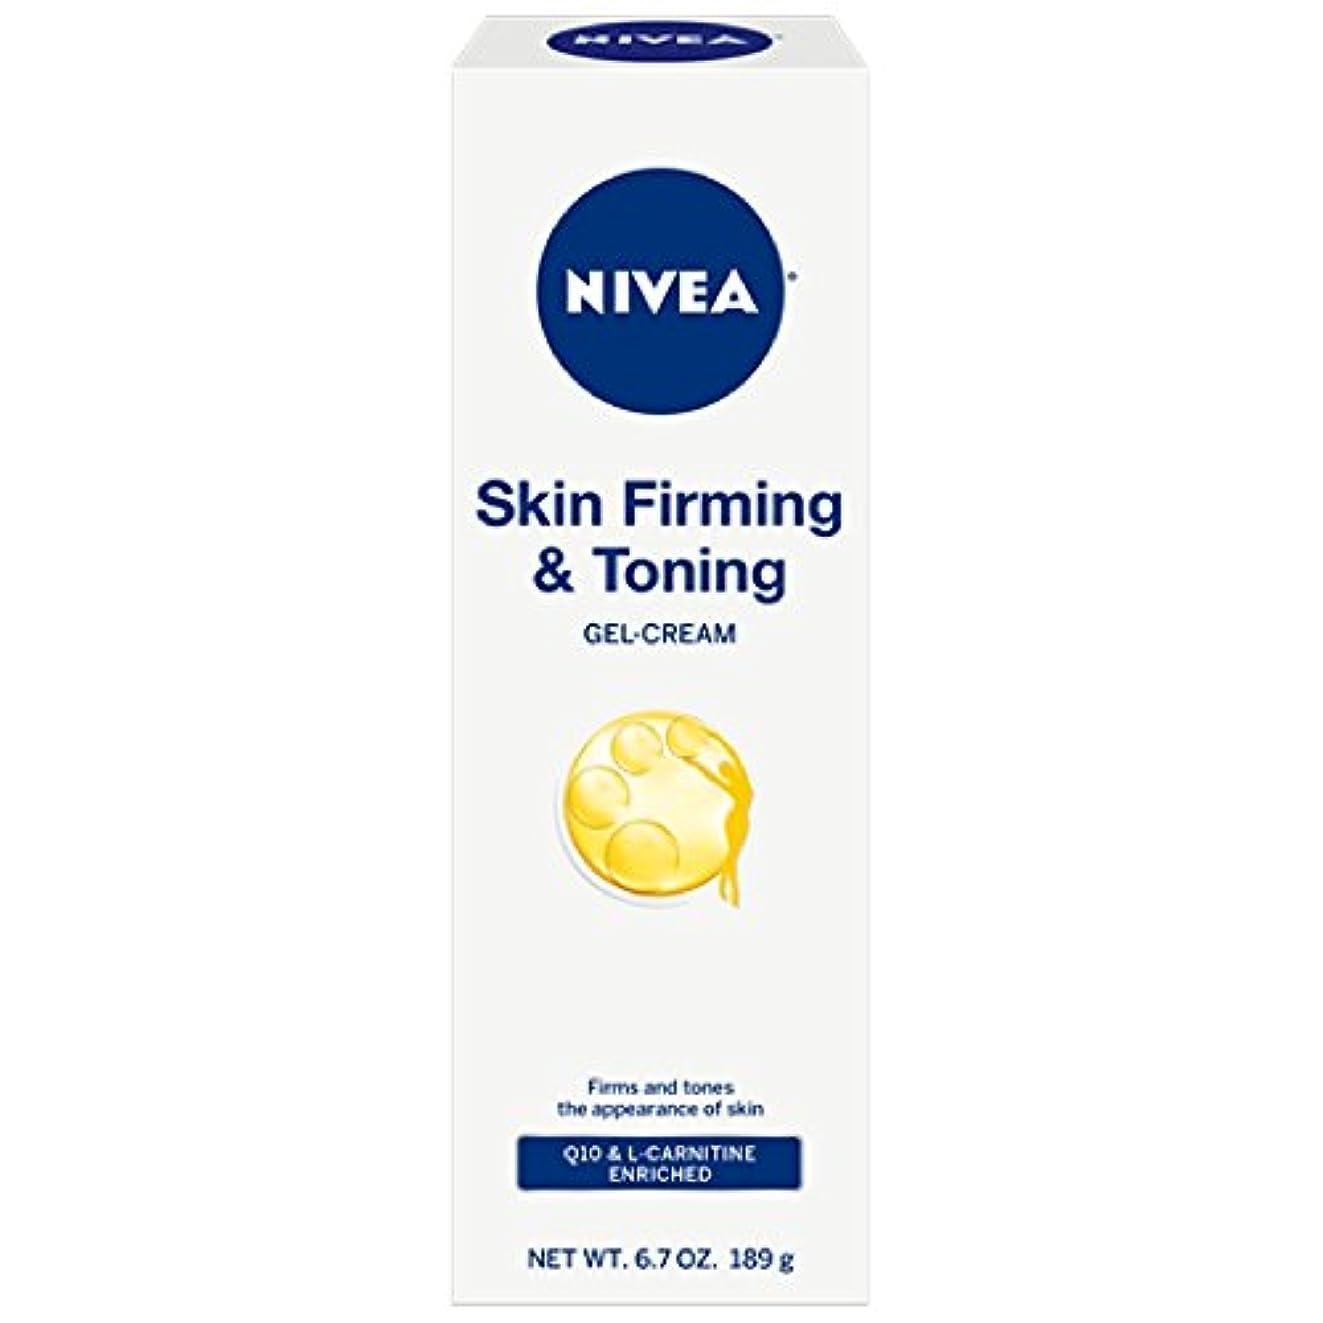 Nivea Good-Bye Cellulite Gel-Cream 200 ml (並行輸入品)